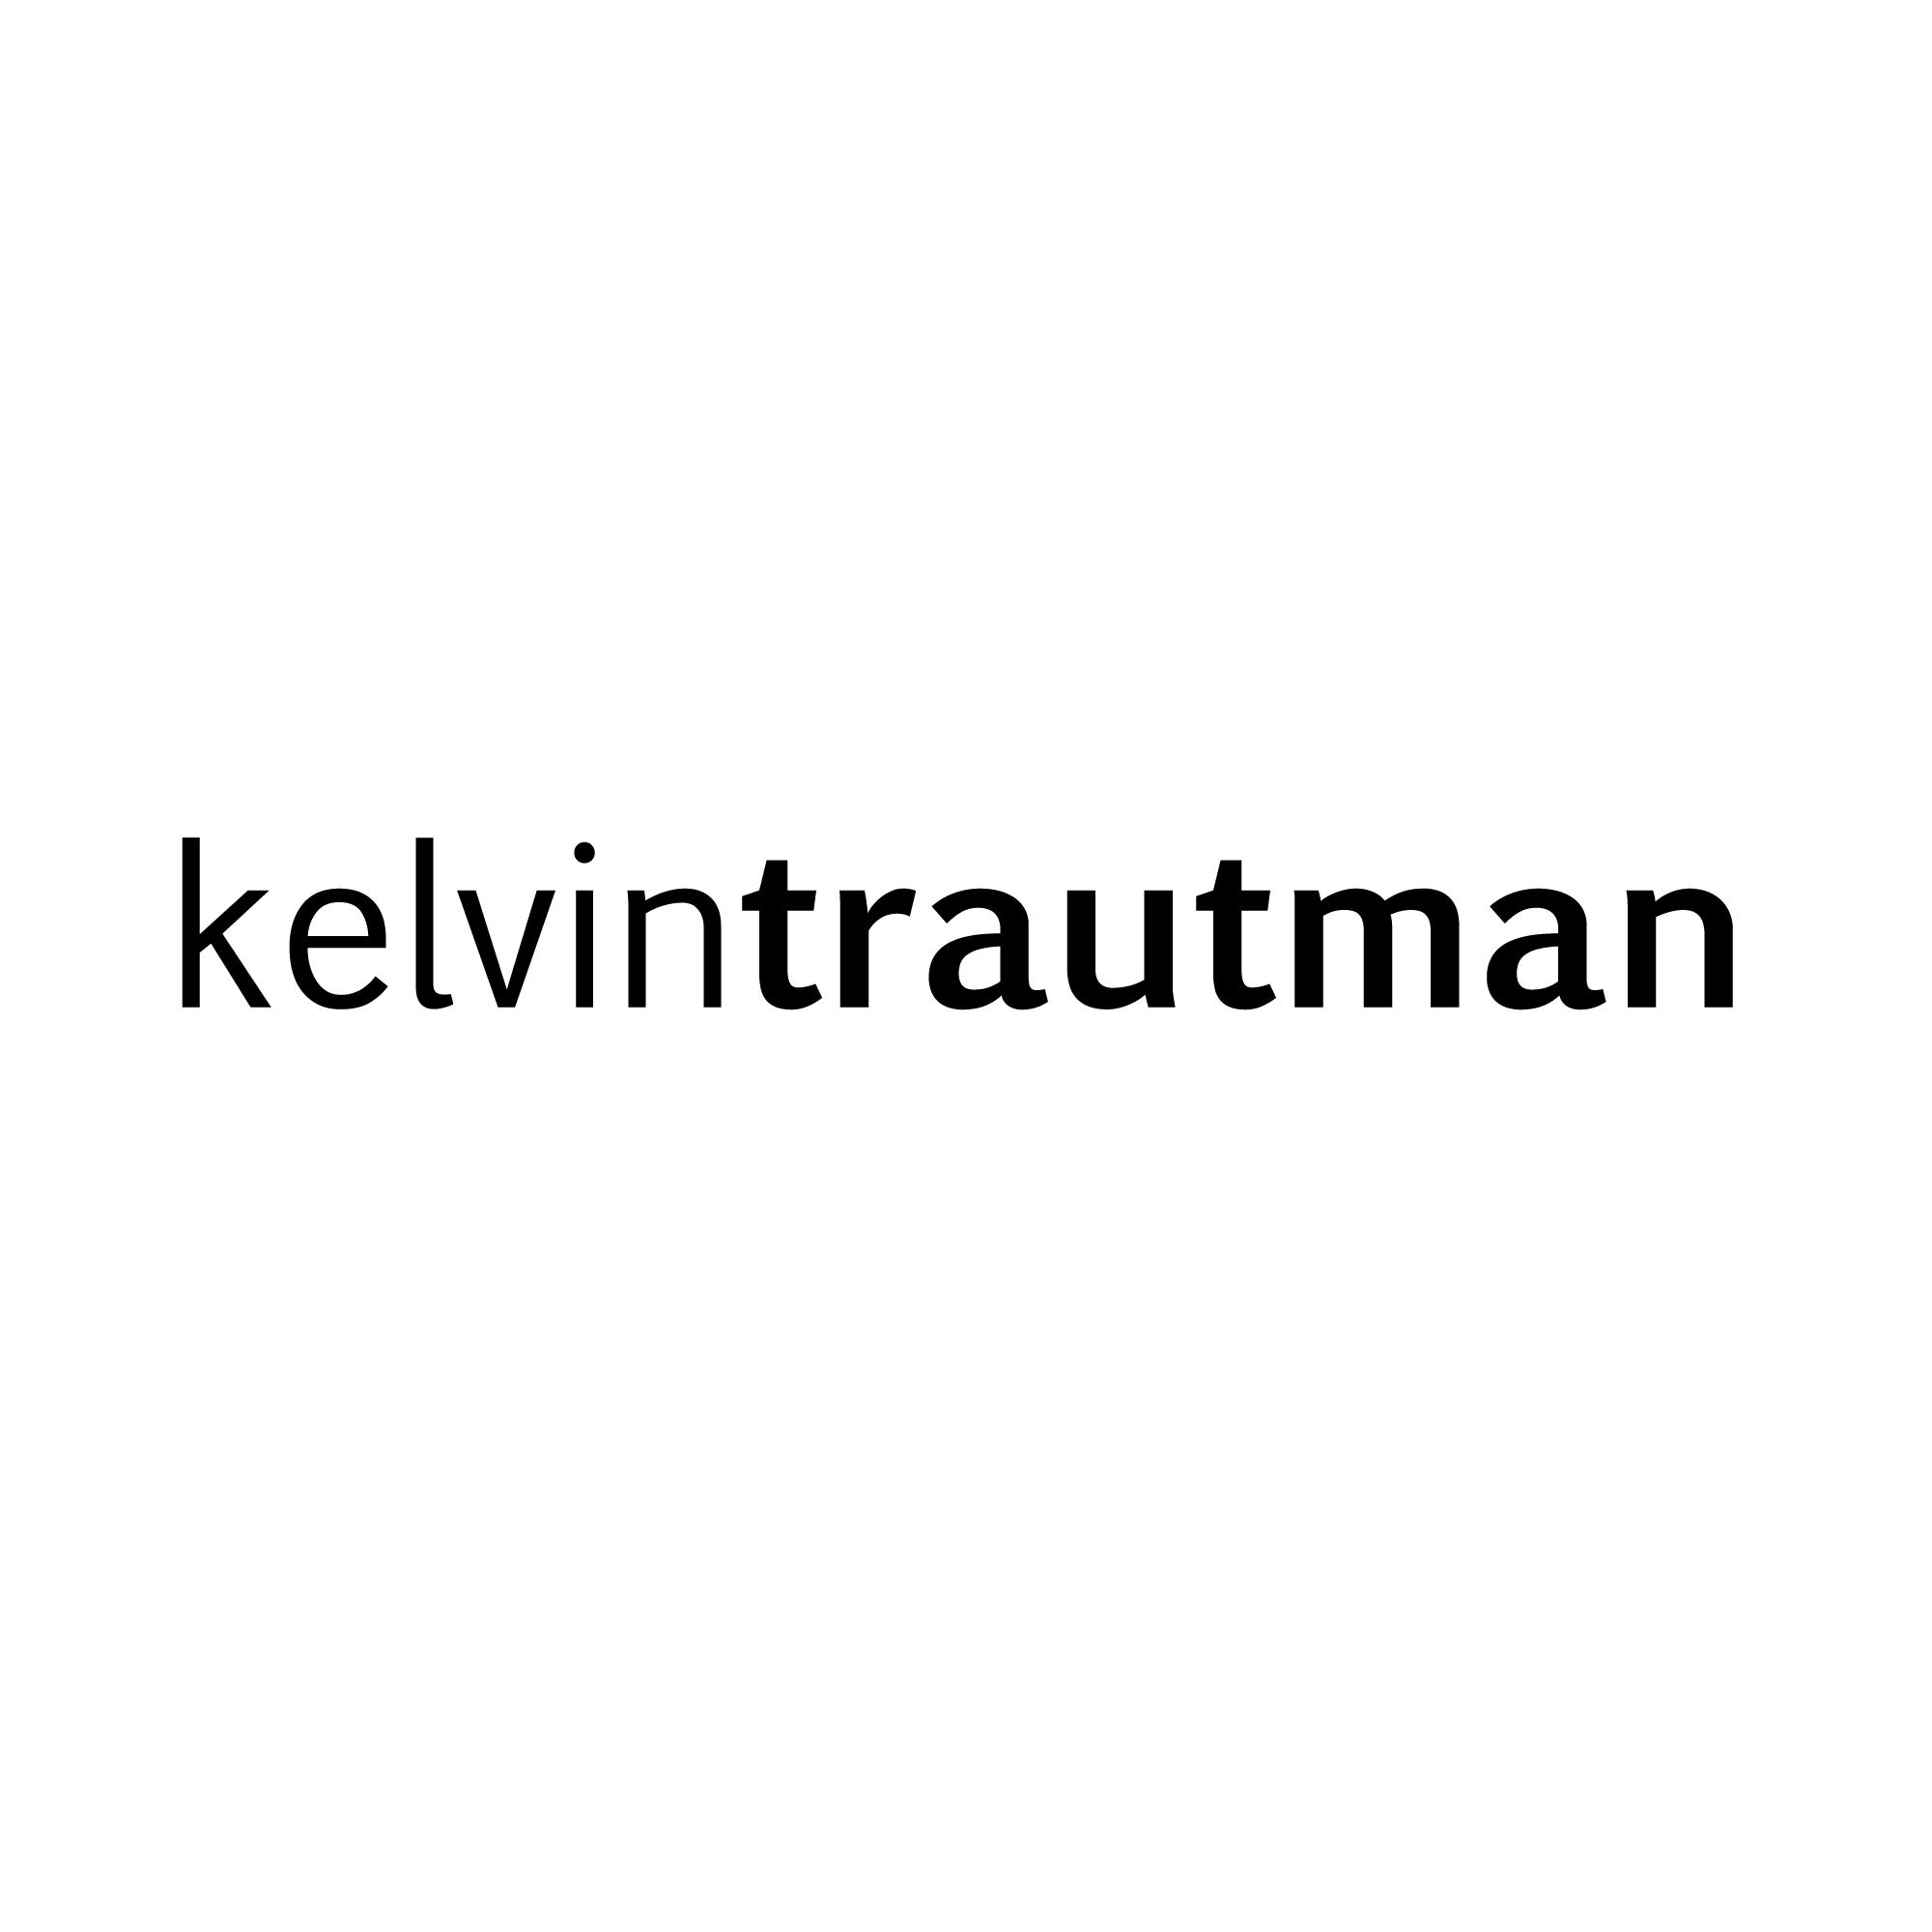 Media and Kelvin